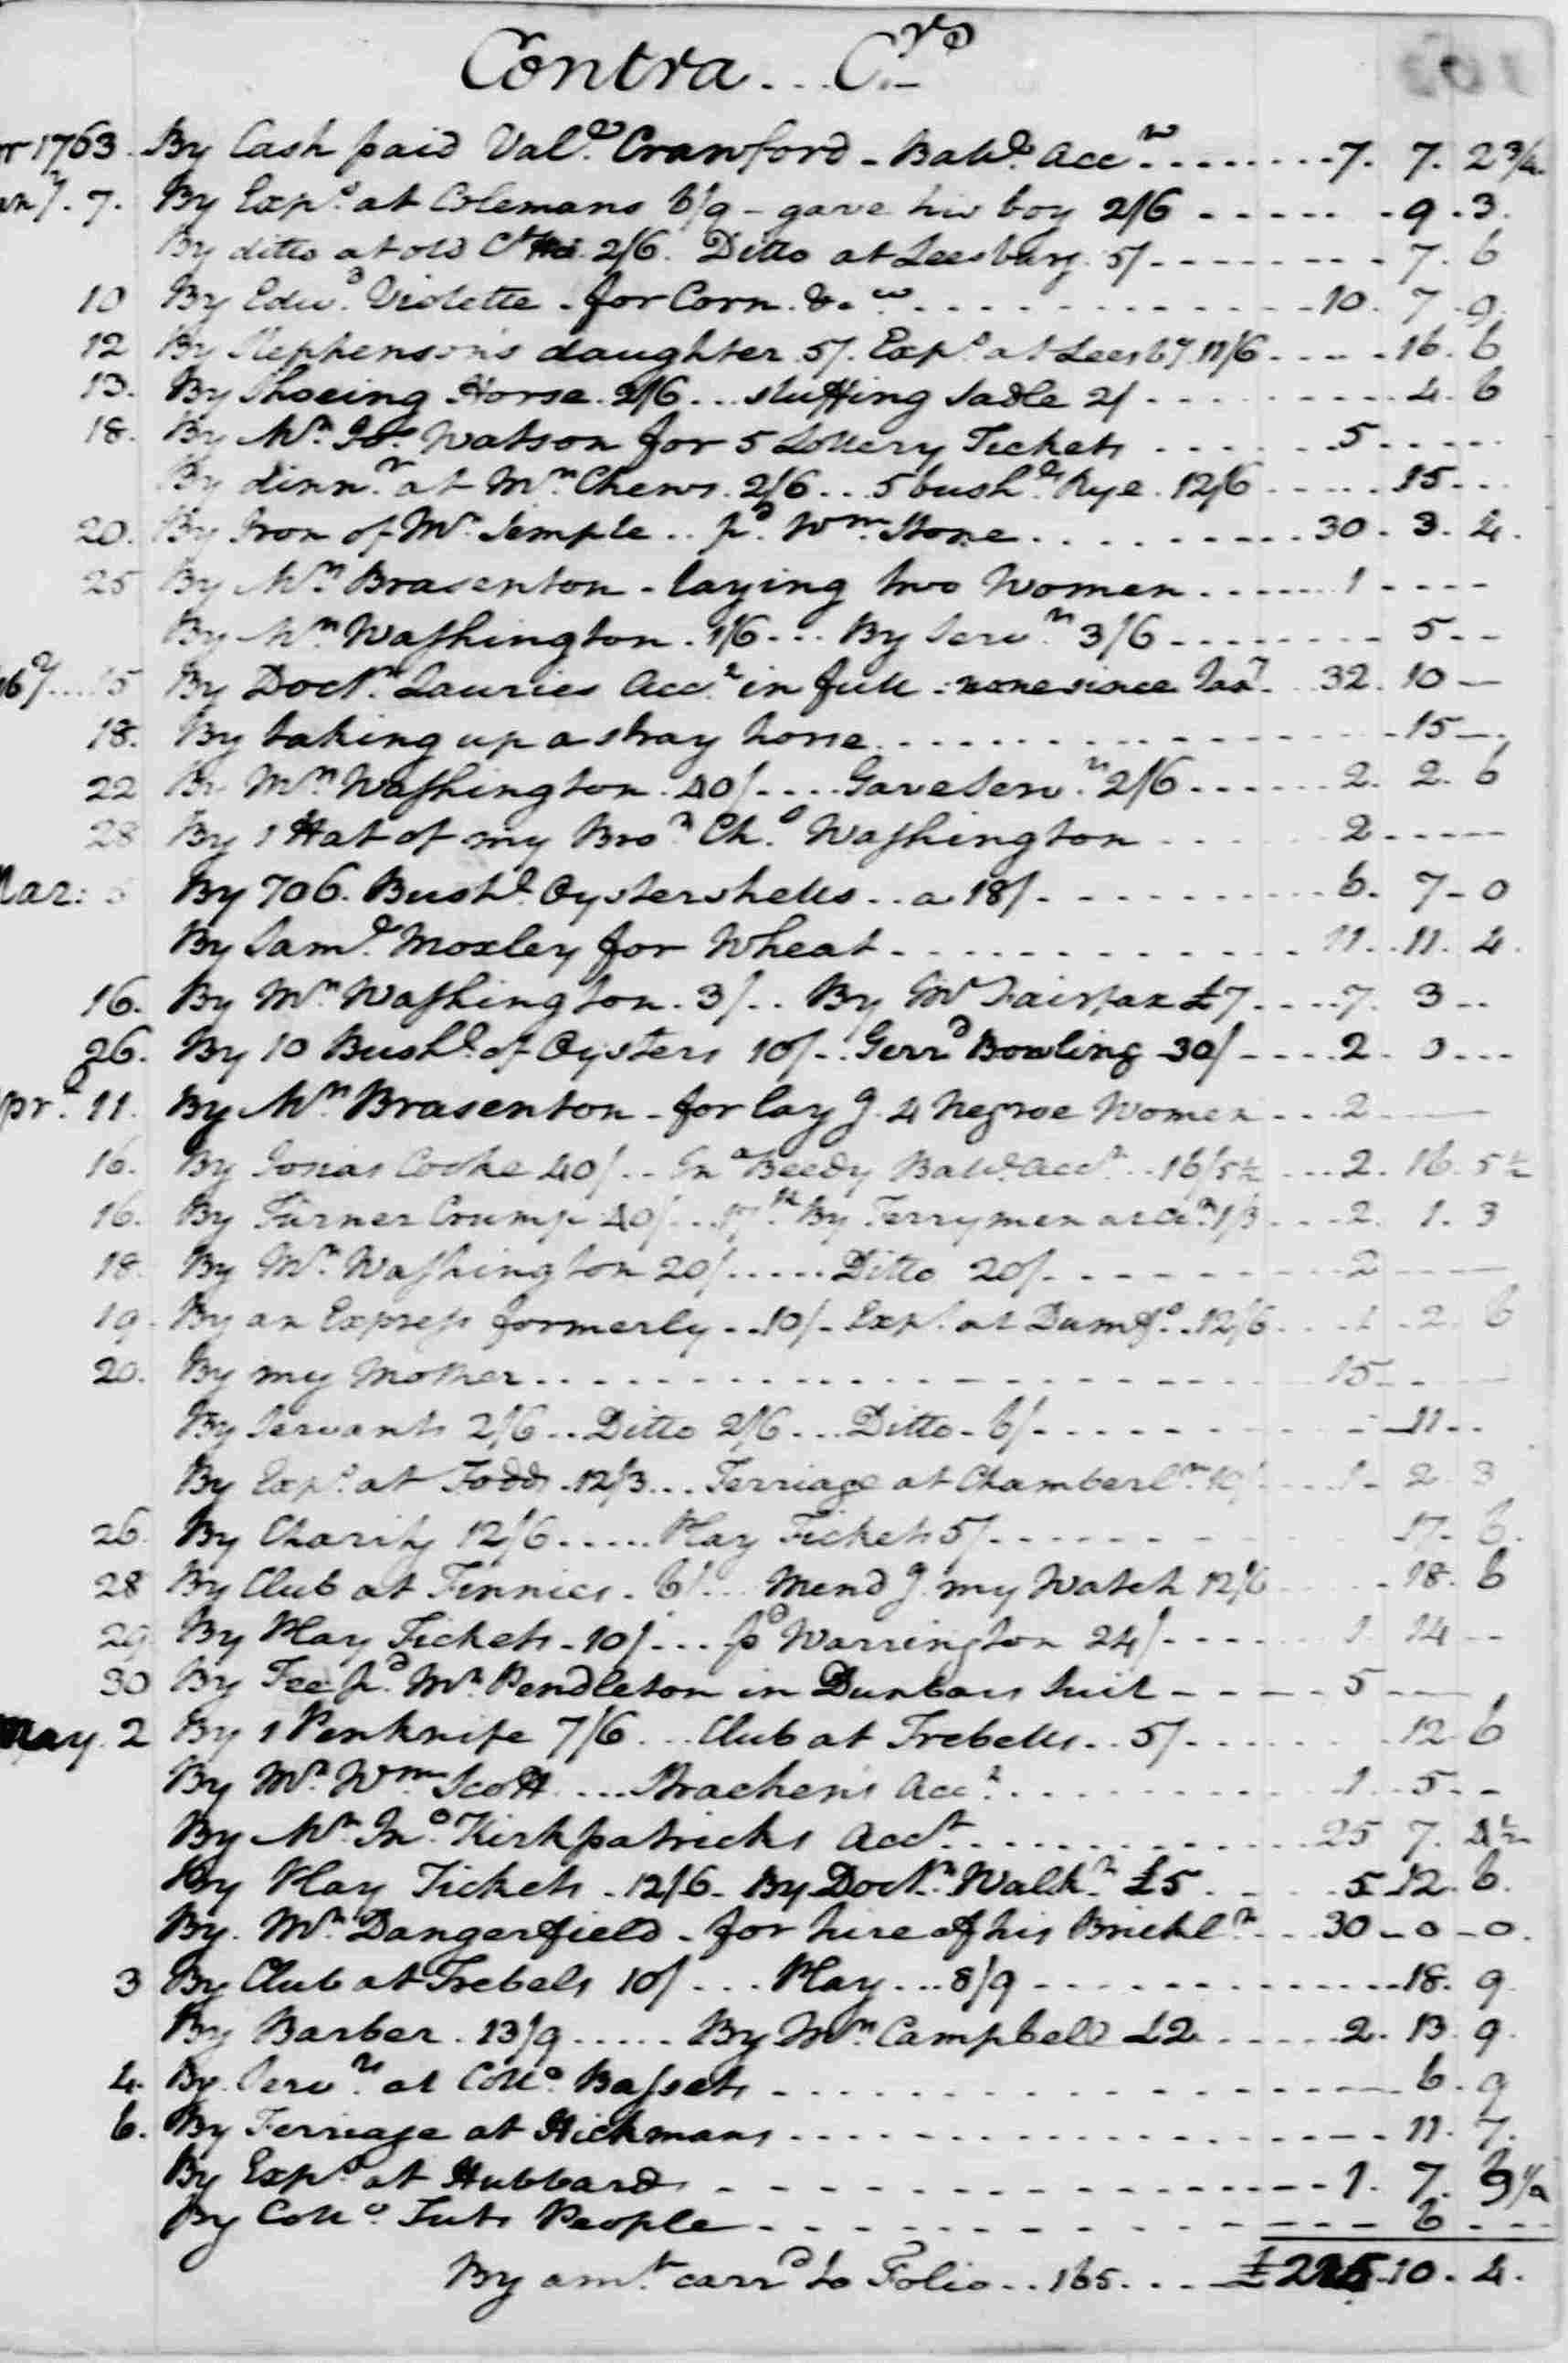 Ledger A, folio 160, right side